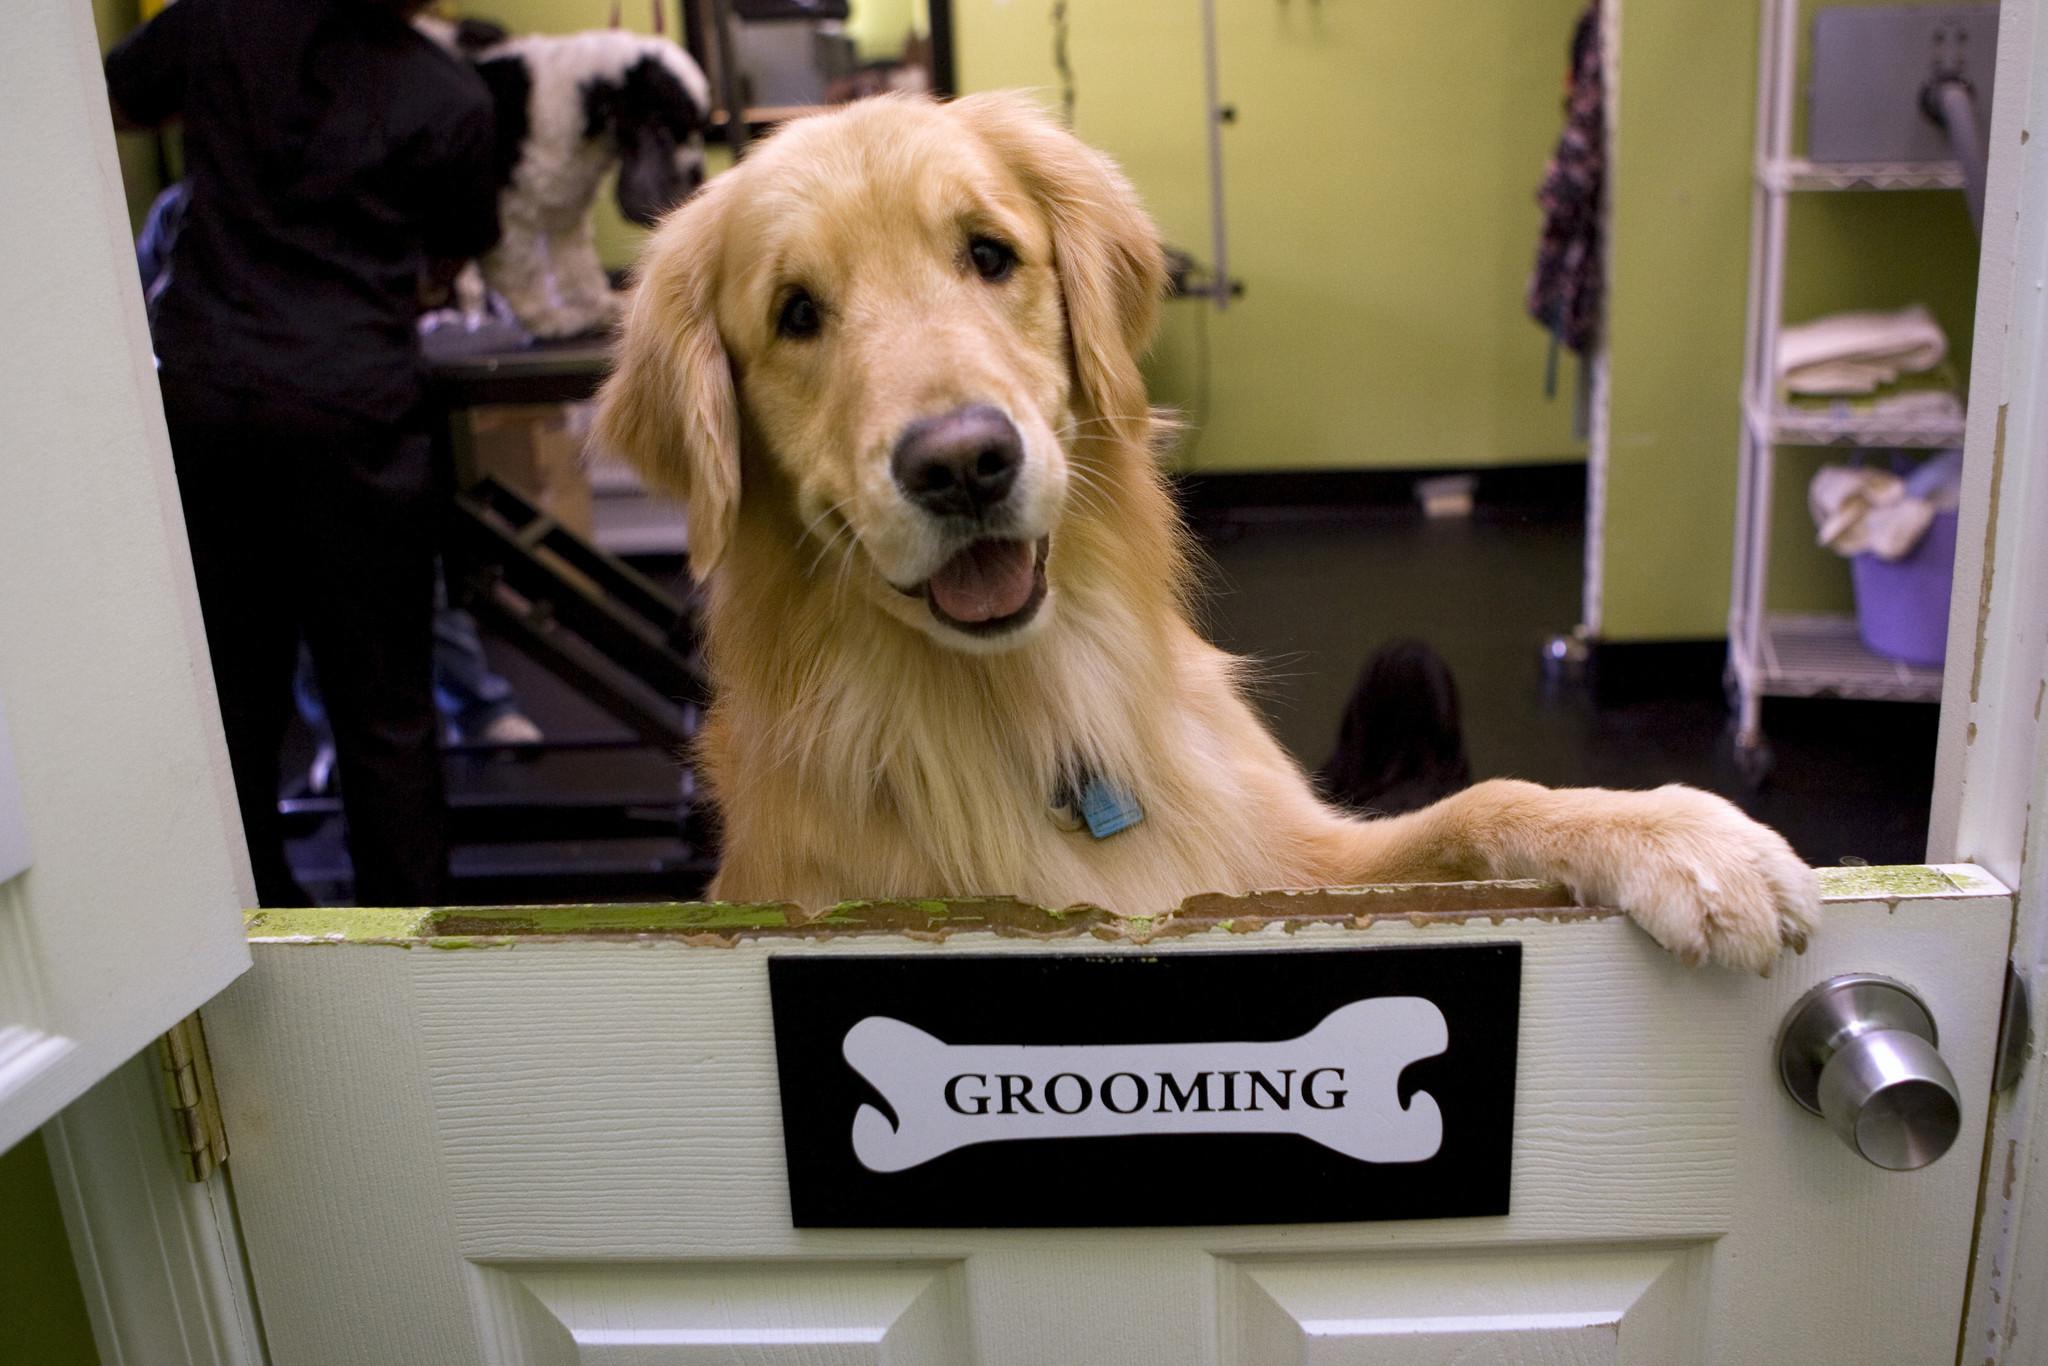 Labrador retrievers hit their 25th year as top U.S. dog breed